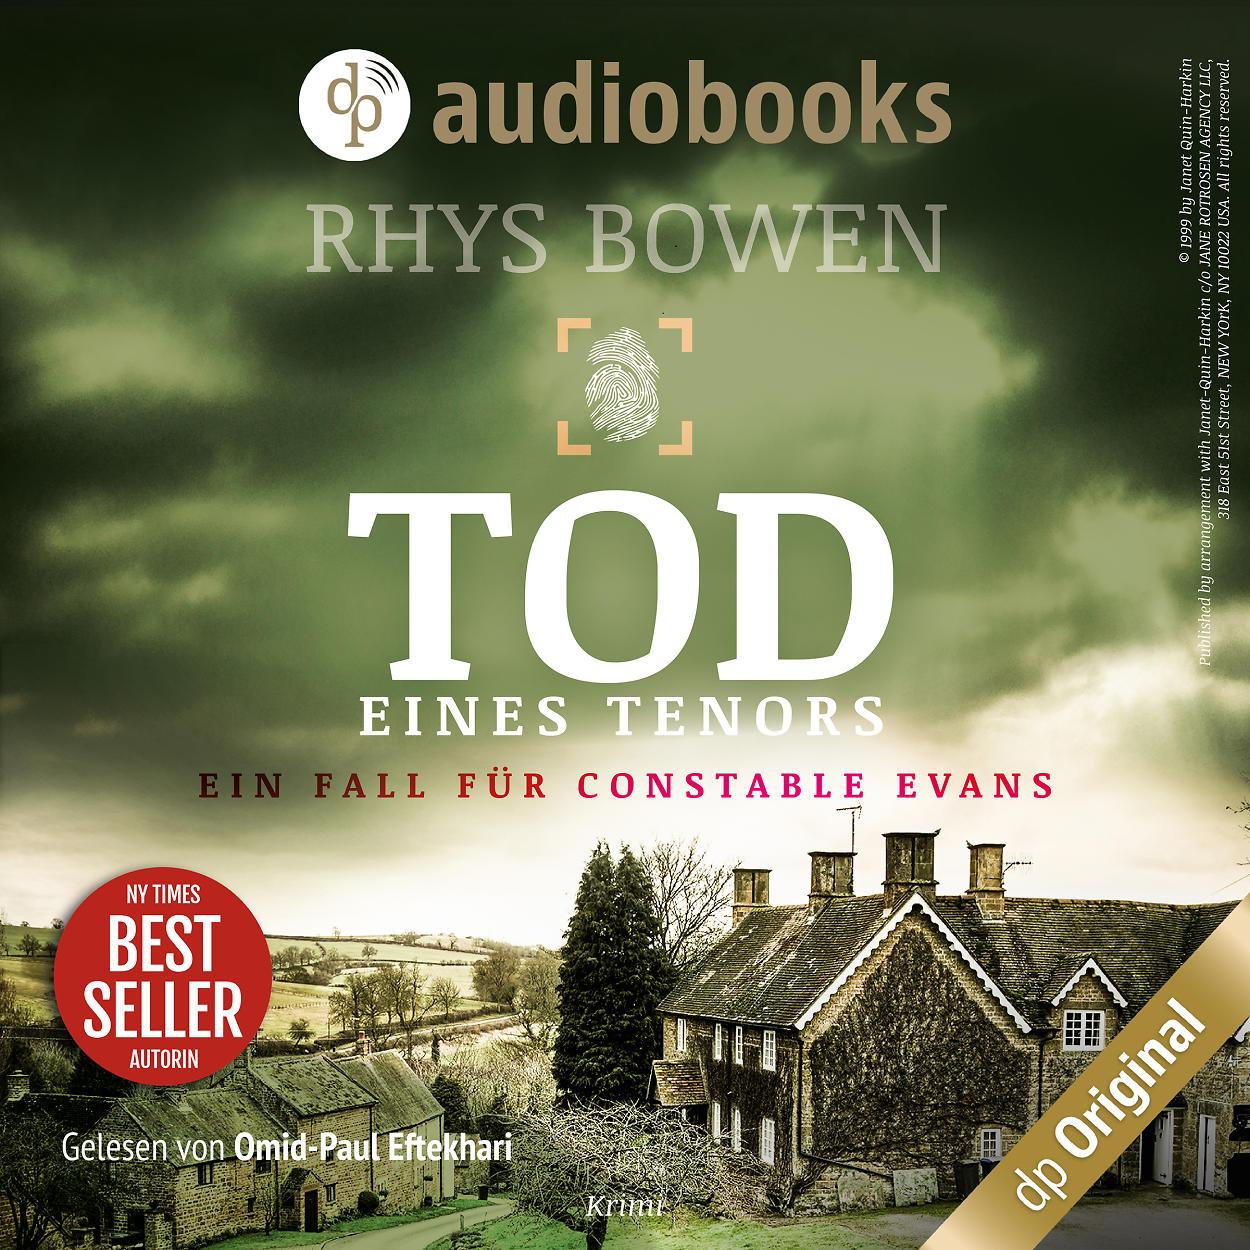 Audiobook - Tod eines Tenors